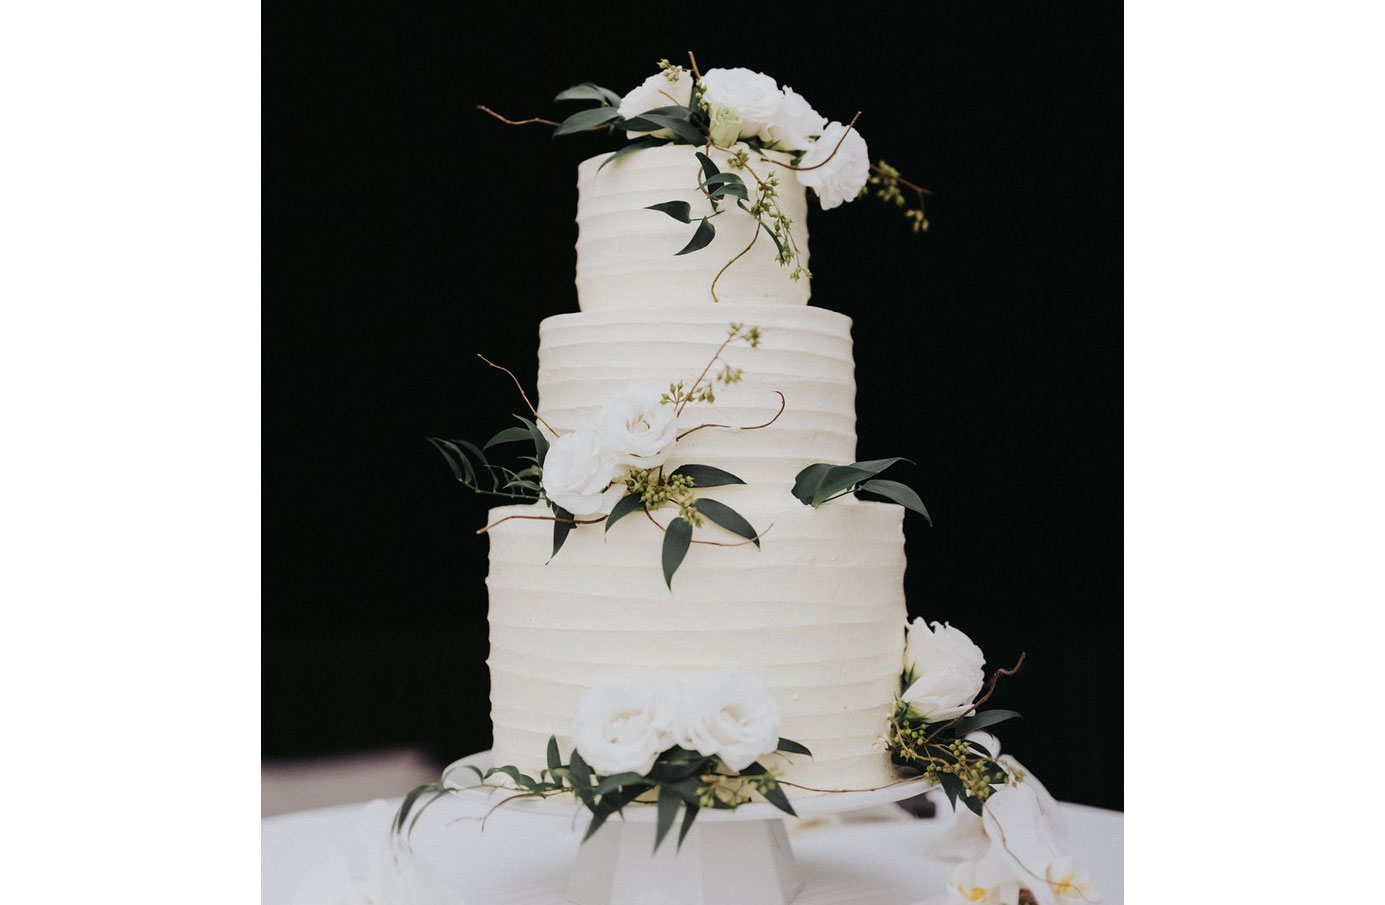 phuket-wedding-como (1)